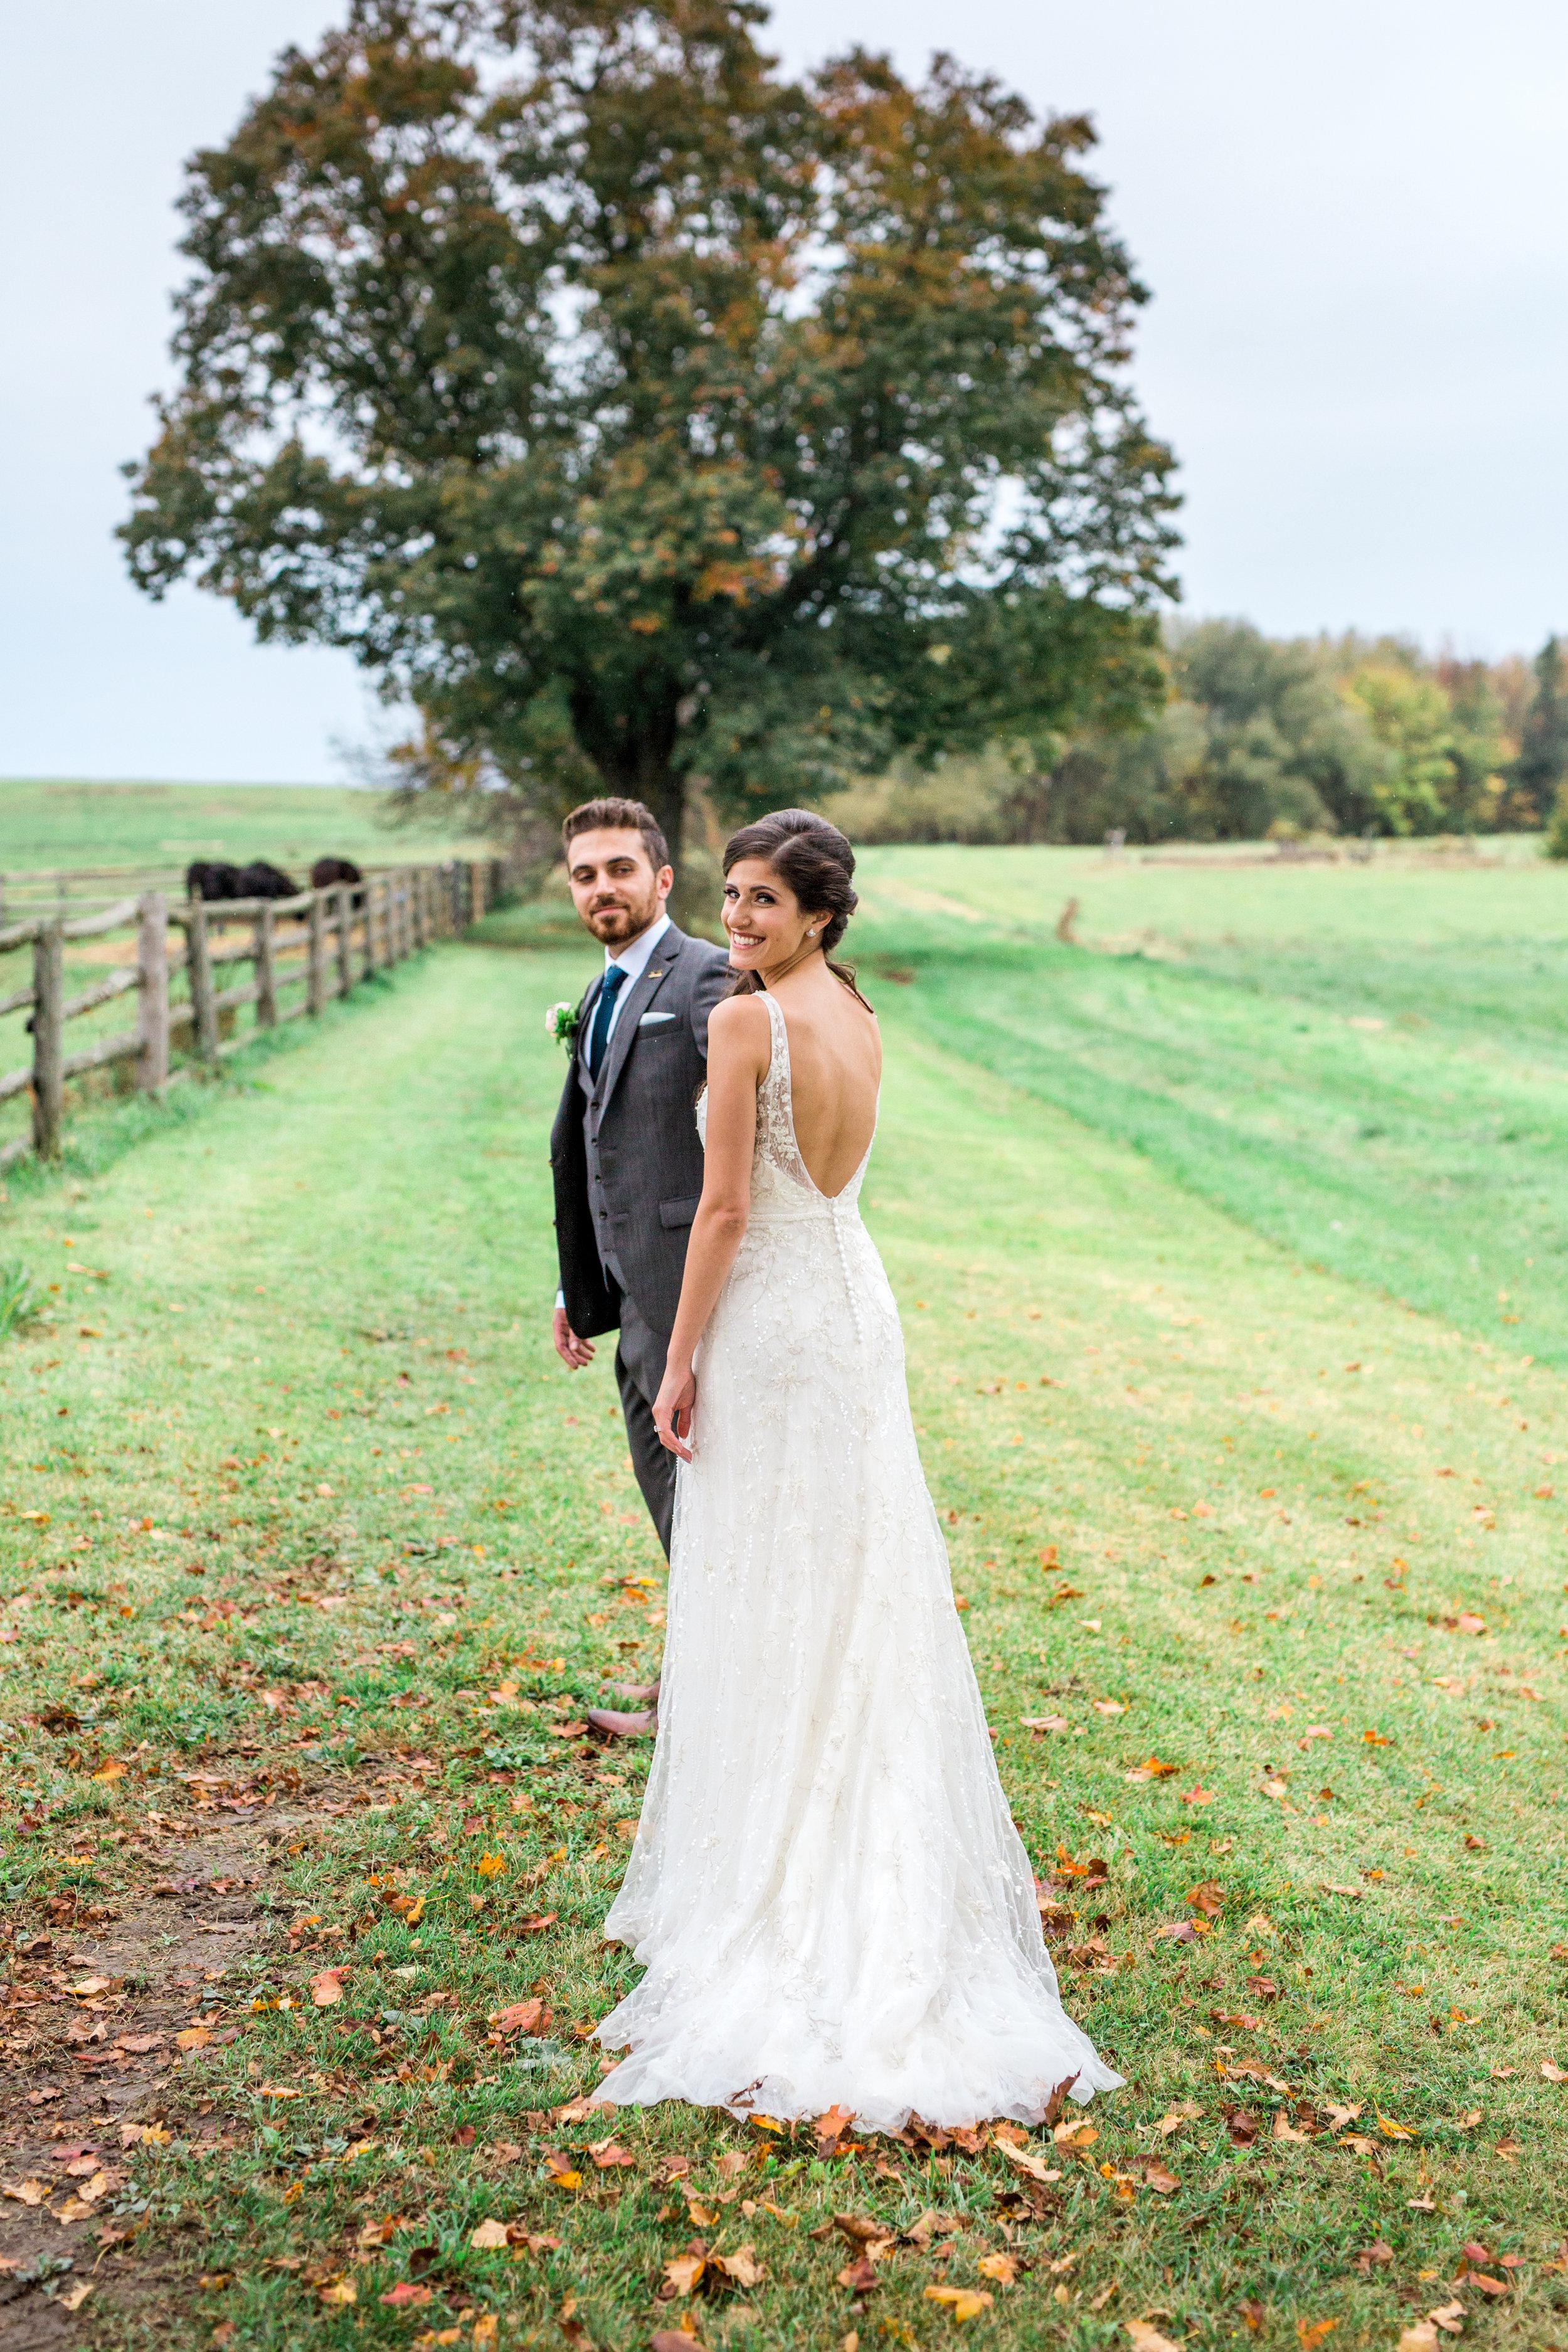 Amir-Golbazi-Danielle-Giroux-Photography_Toronto-Wedding_Cedarwood_Rachel-Paul_472.jpg